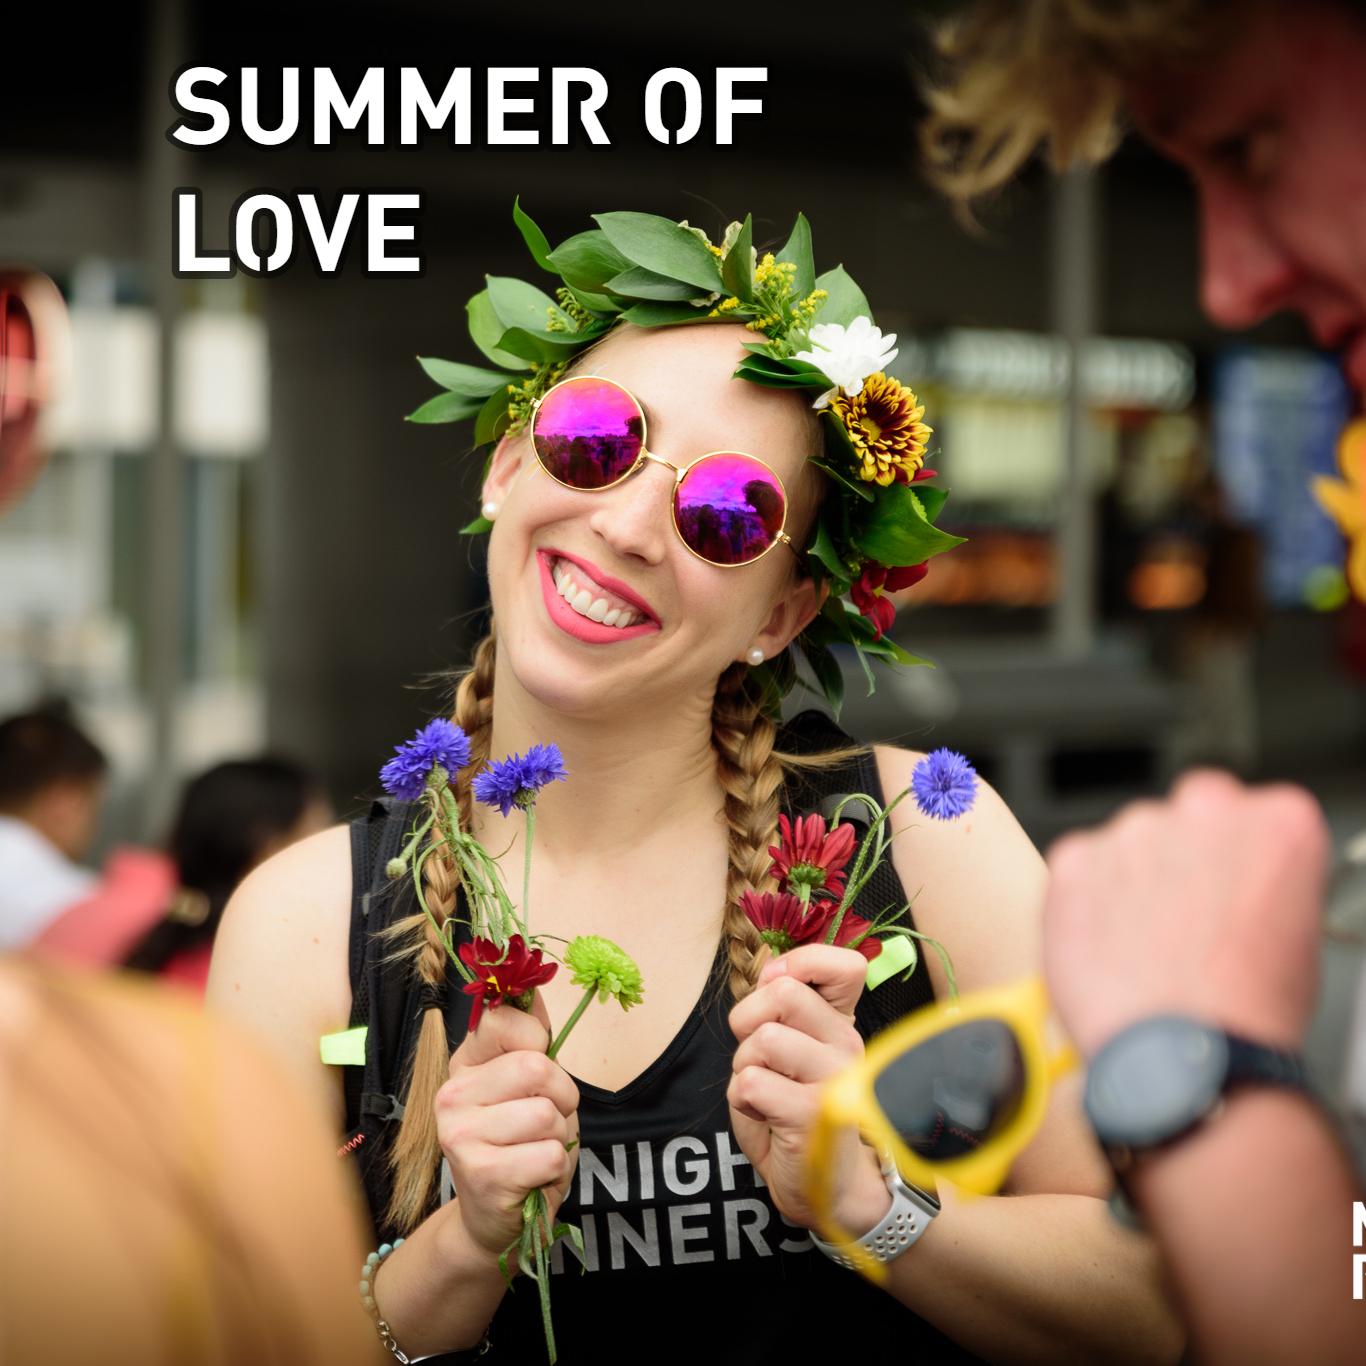 summer_of_love_DV.jpg